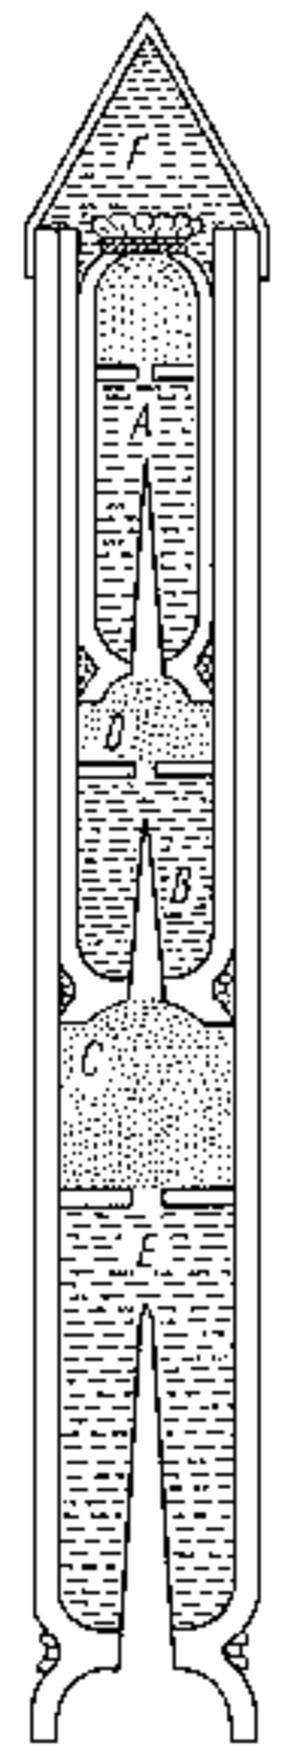 Casimir Siemienowicz - Siemenowicz multi-stage rocket, from his Artis Magnae Artilleriae pars prima